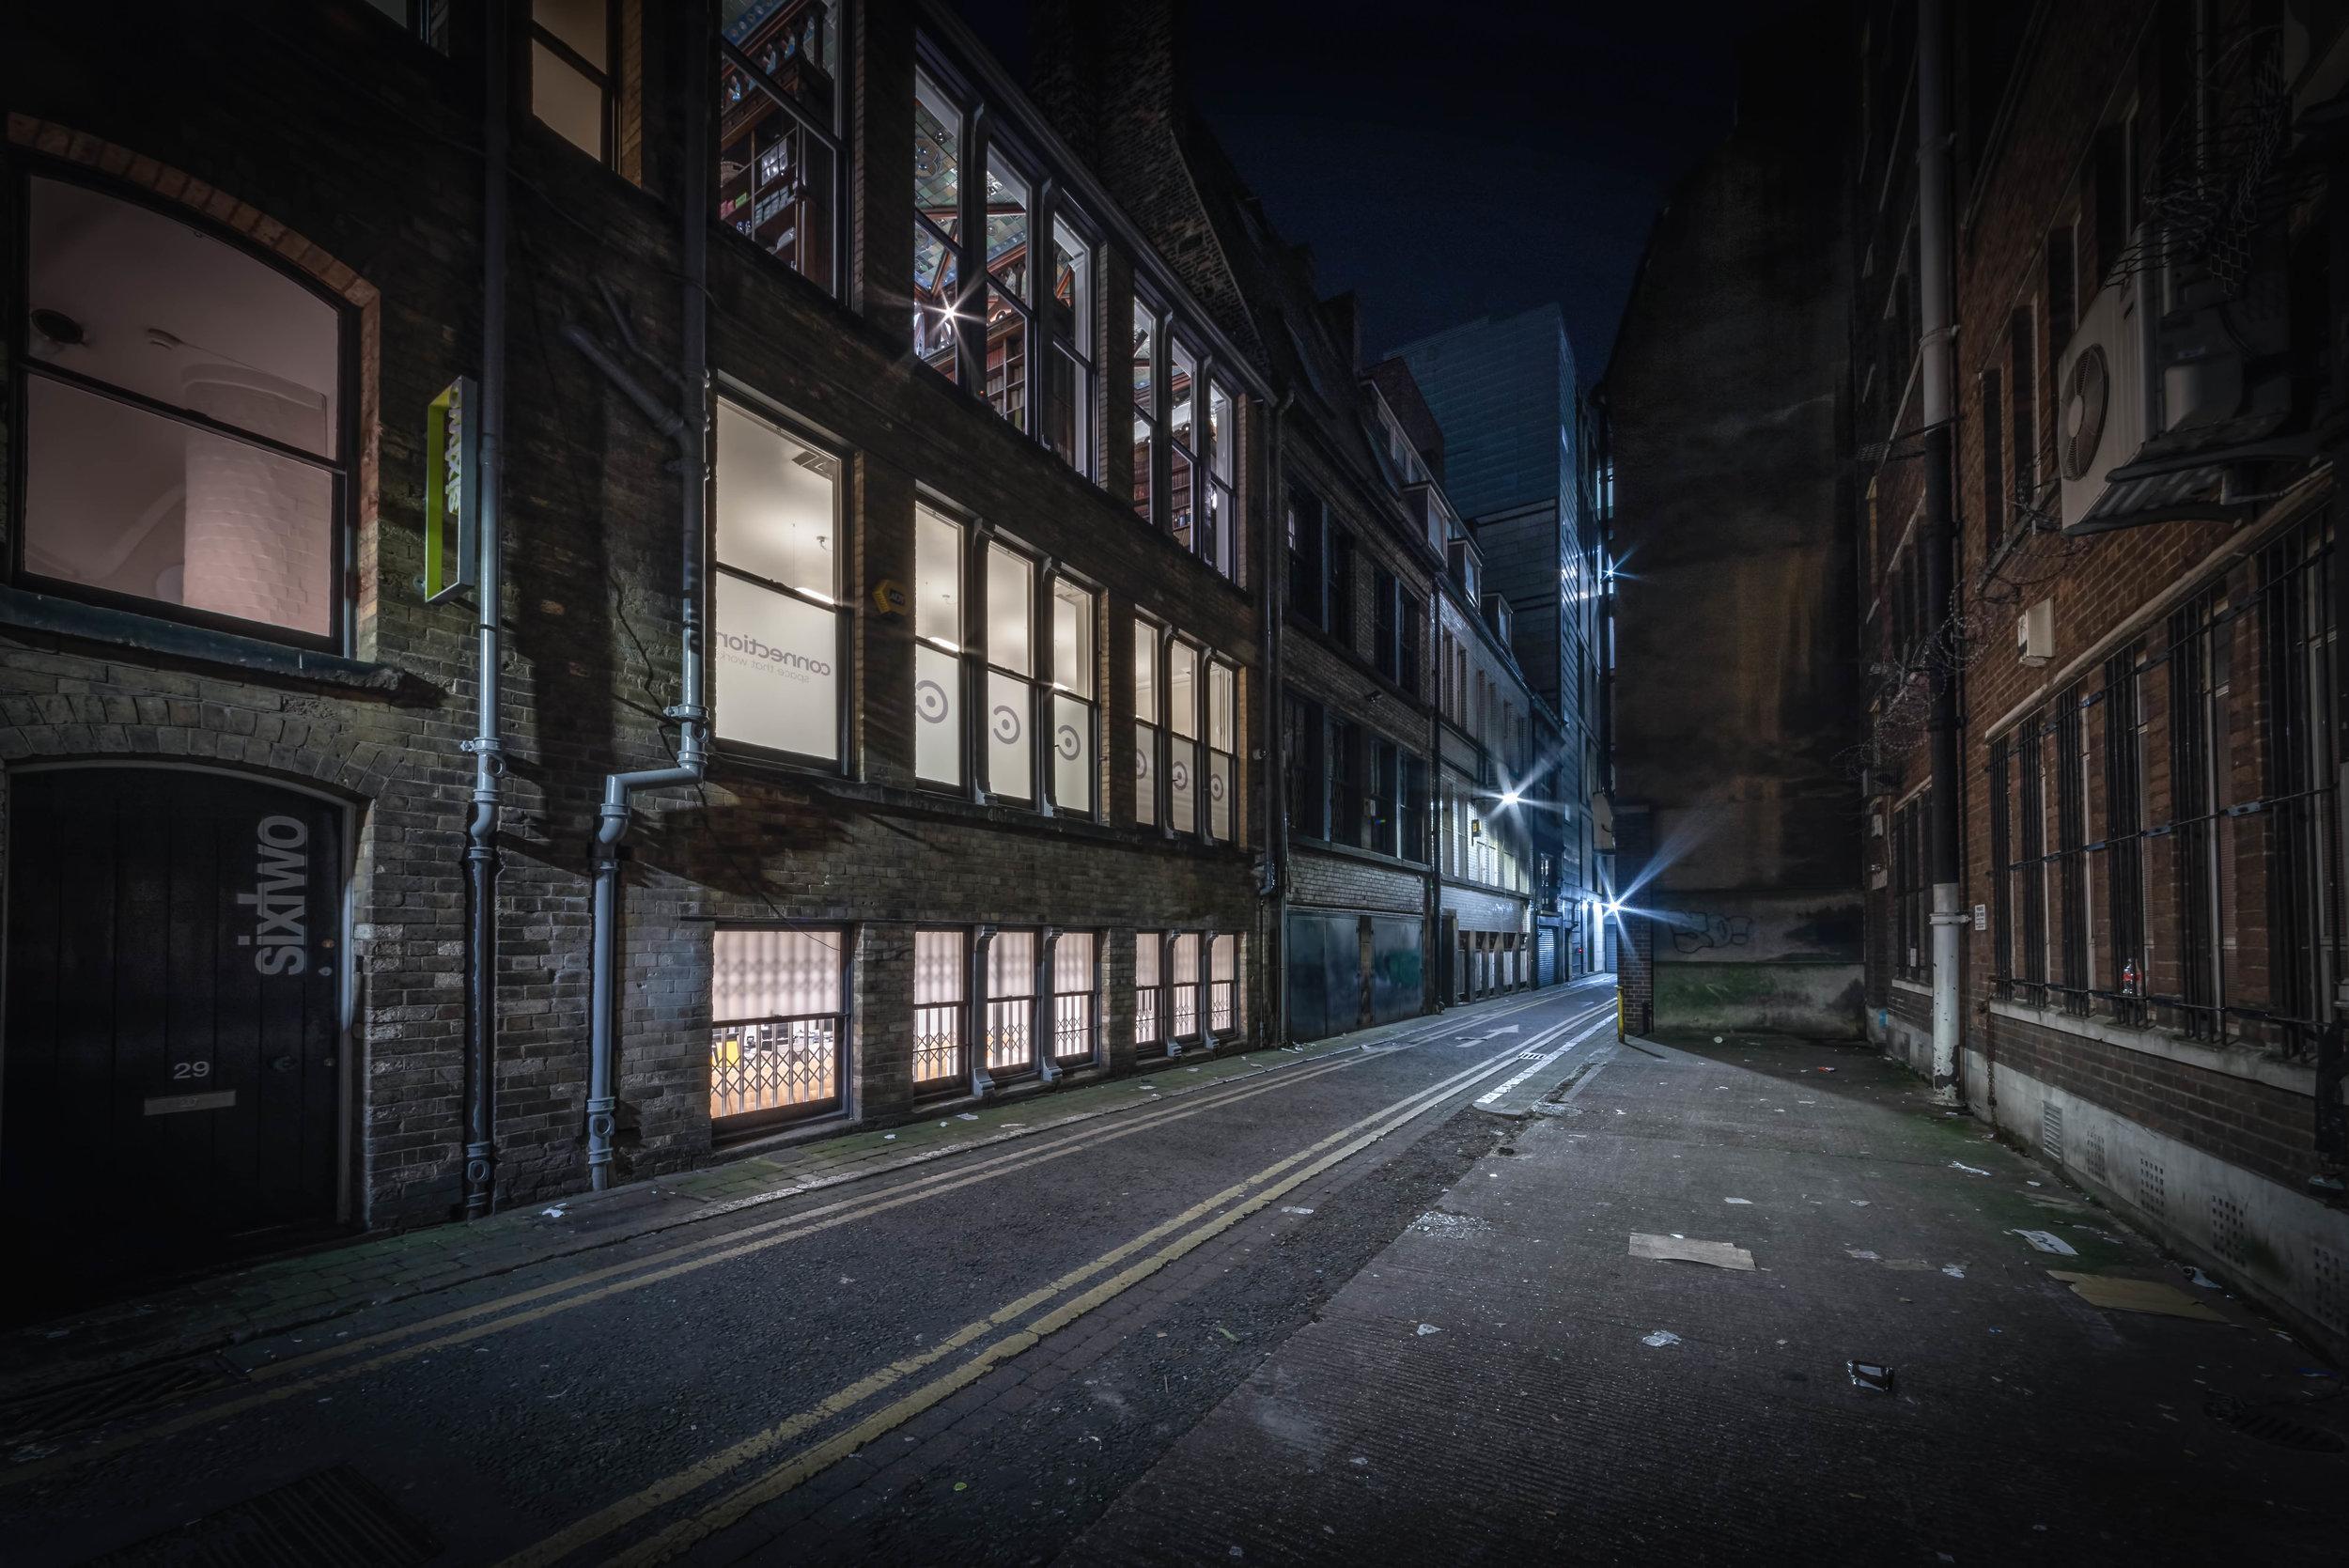 Manchester wide angle Feb 2019 (43 of 74)-Edit-Edit-Edit-Edit-Edit.jpg